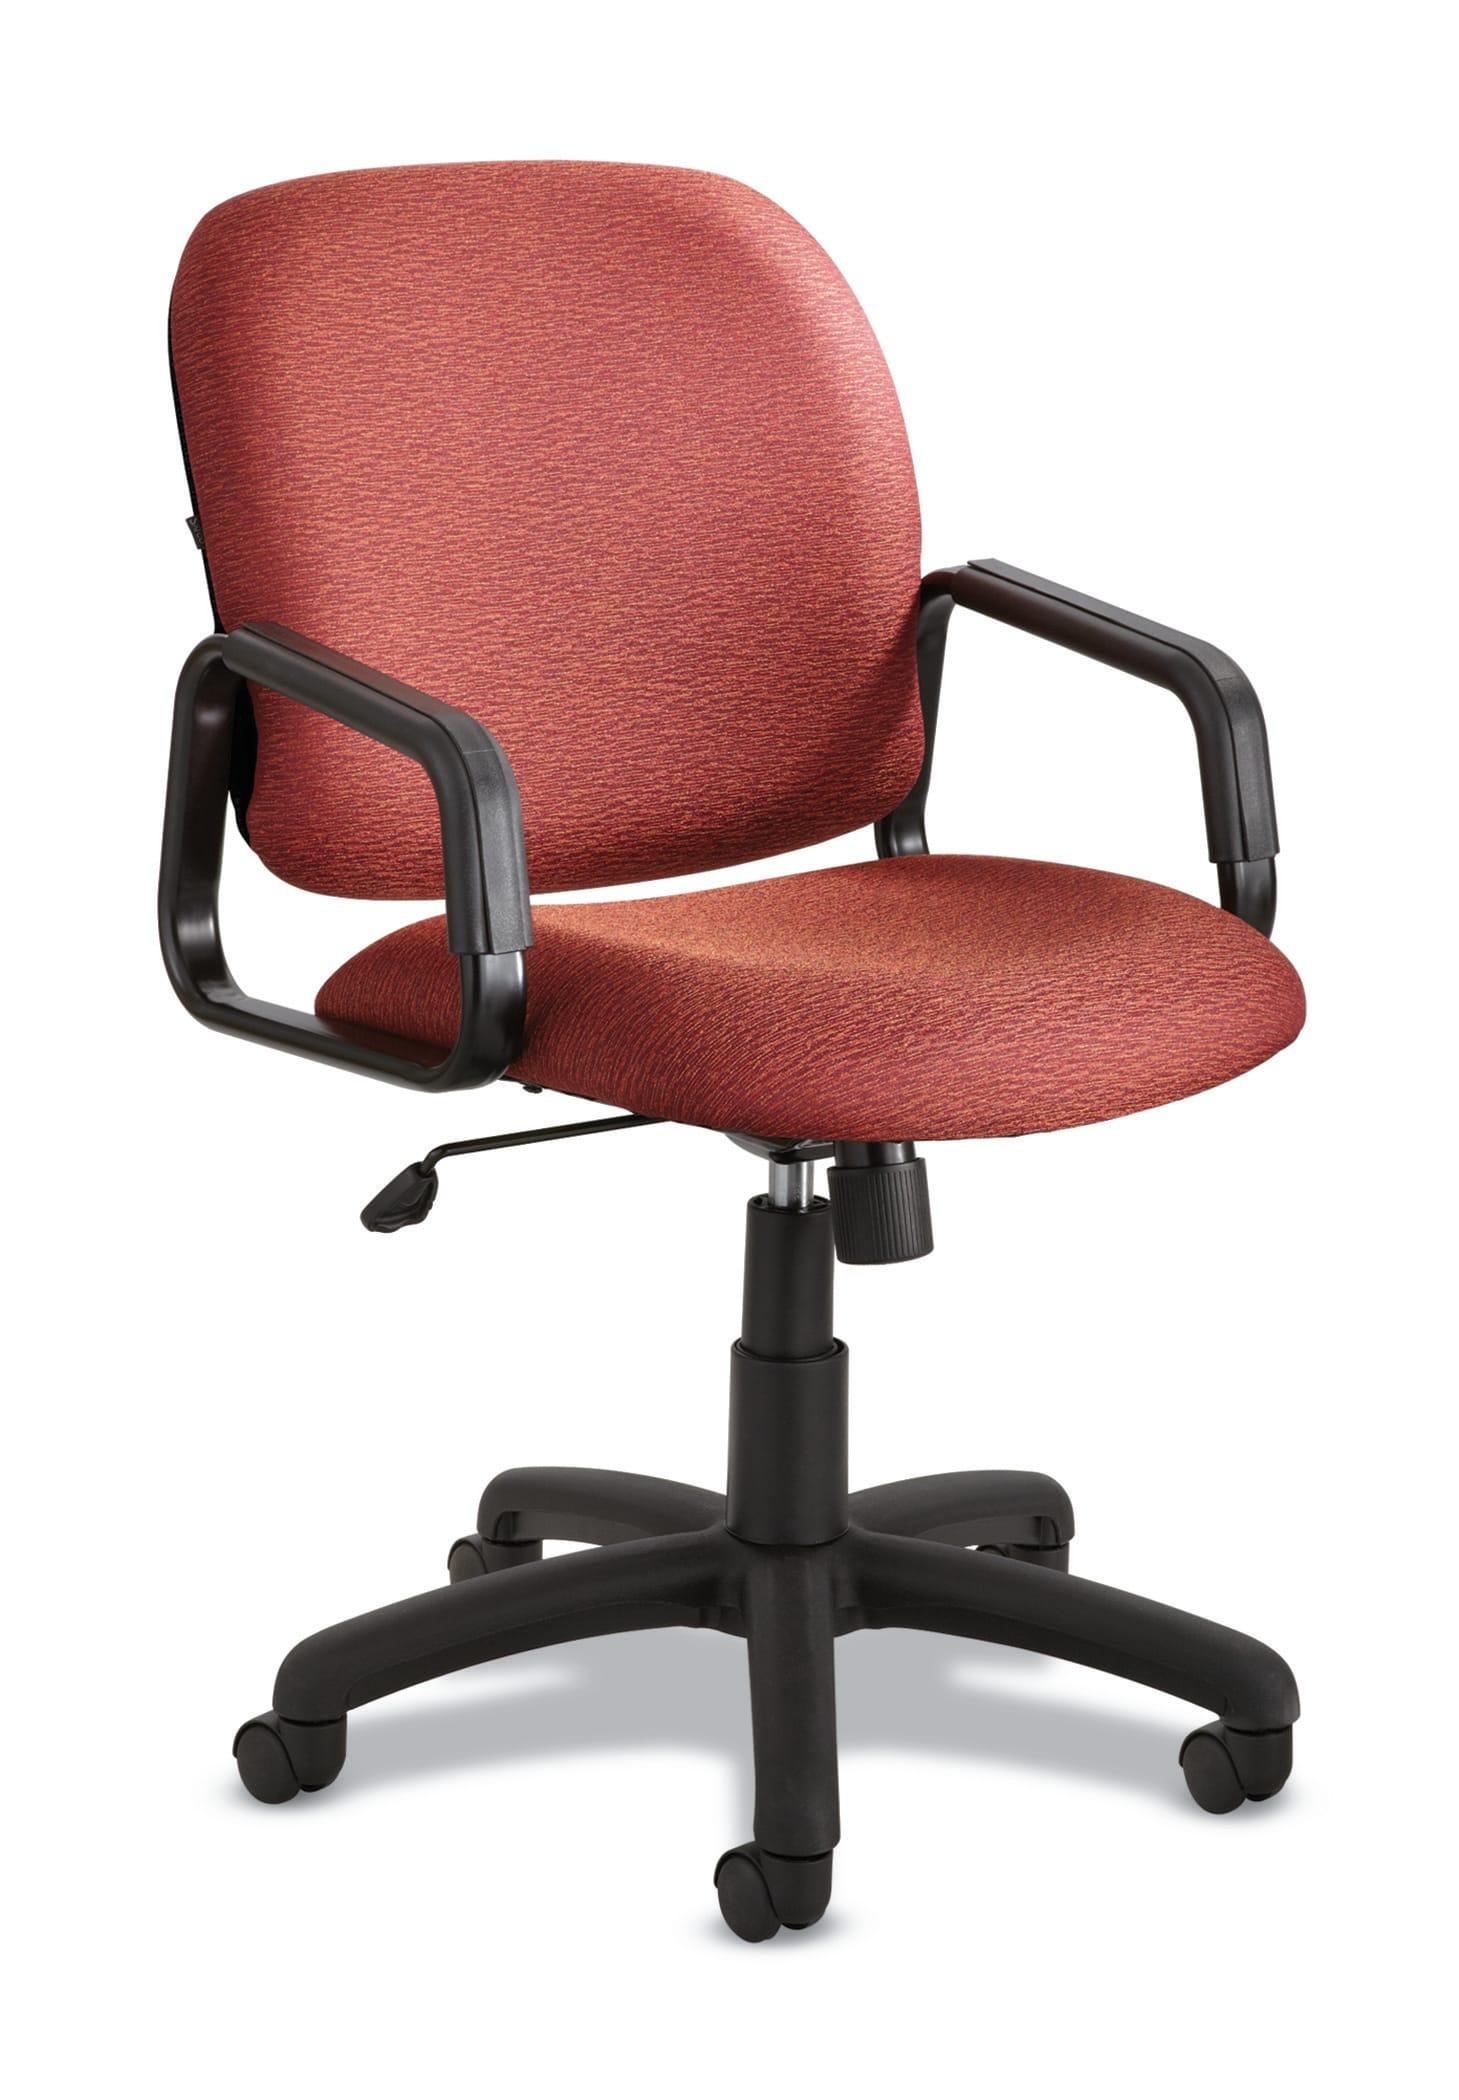 Safco® Cava Urth Fabric High-Back Chair, Burgundy